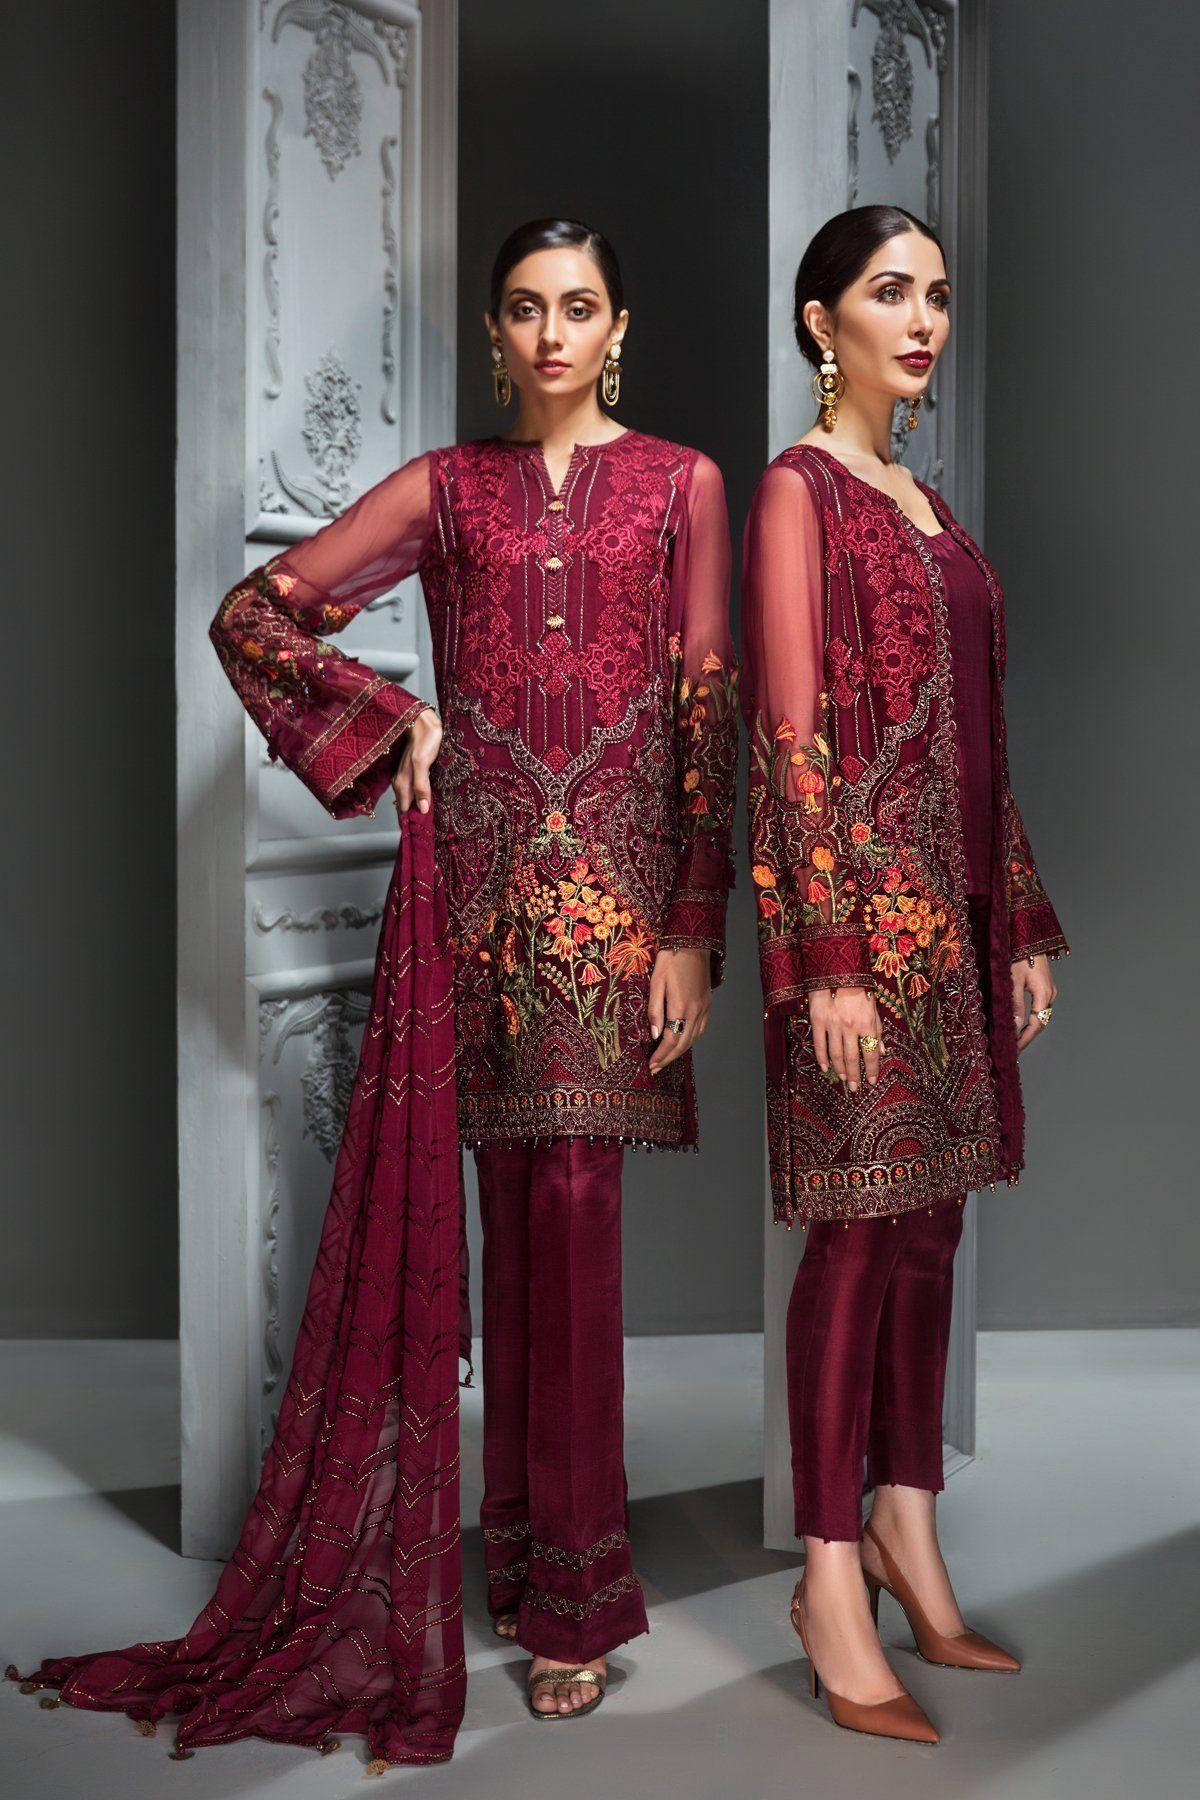 Elegant Pakistani Chiffon Party Dress in Maroon Color